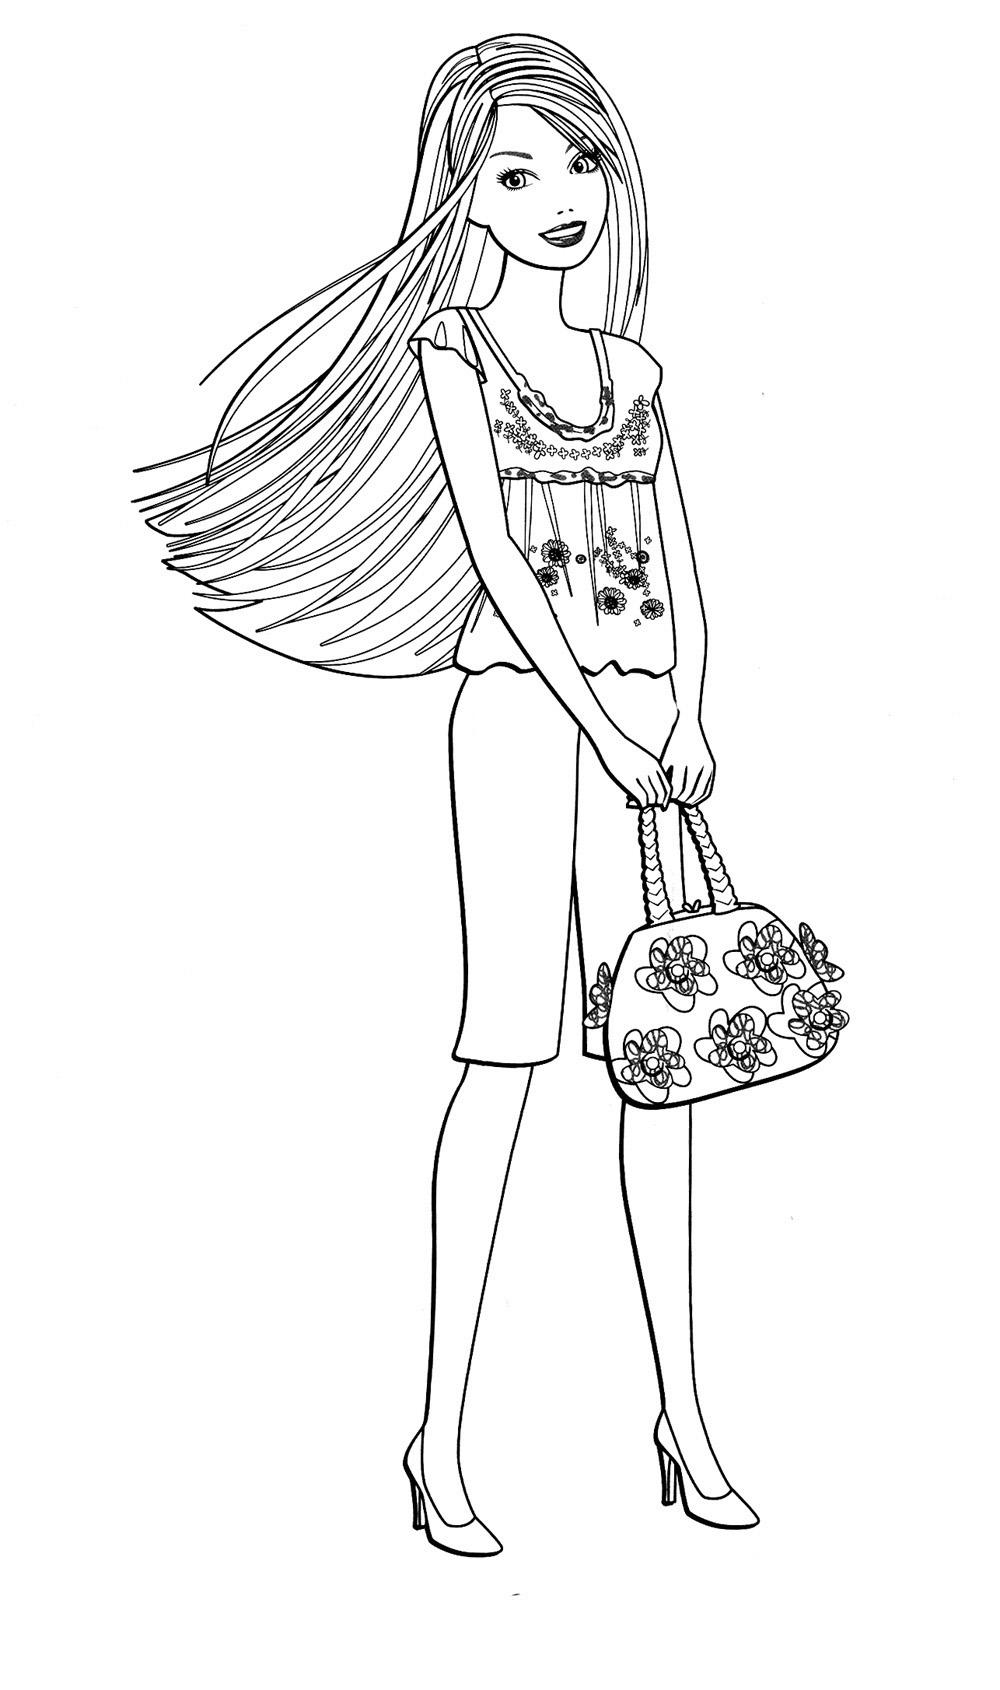 Барби с сумочкой с цветами Раскраски картинки цветов